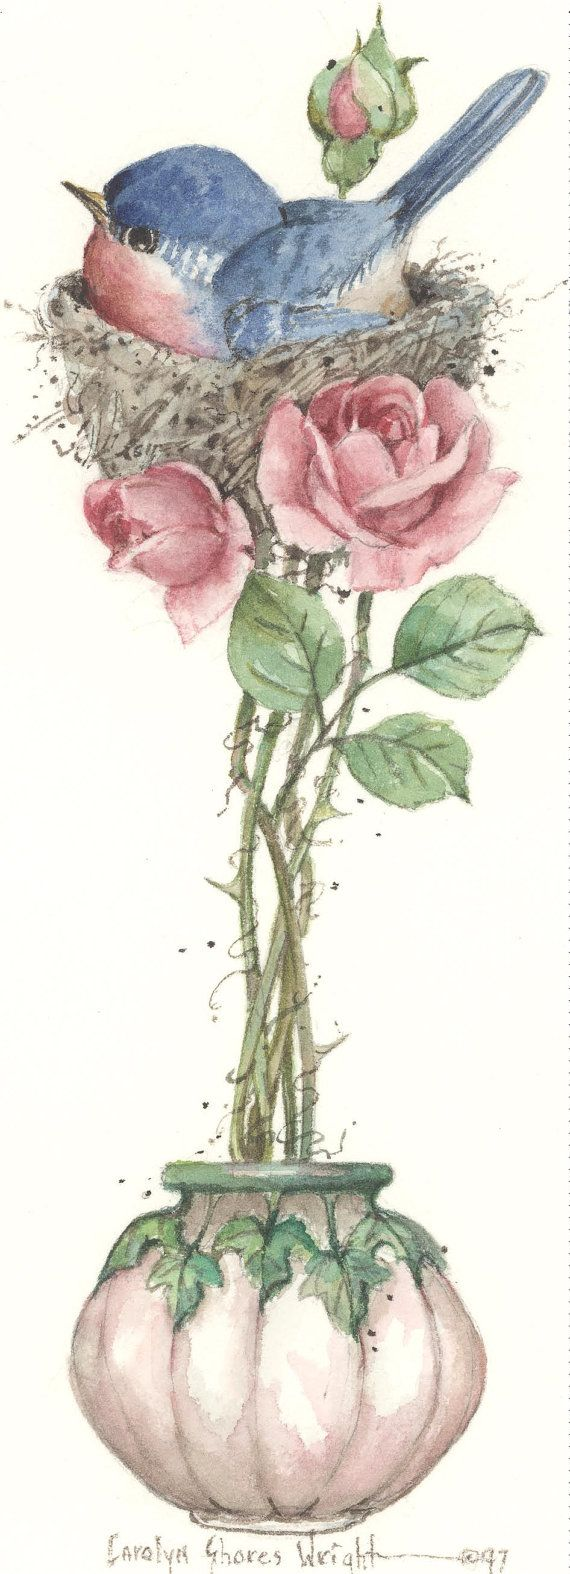 Litografia de Bluebird Topiary 10 x 5